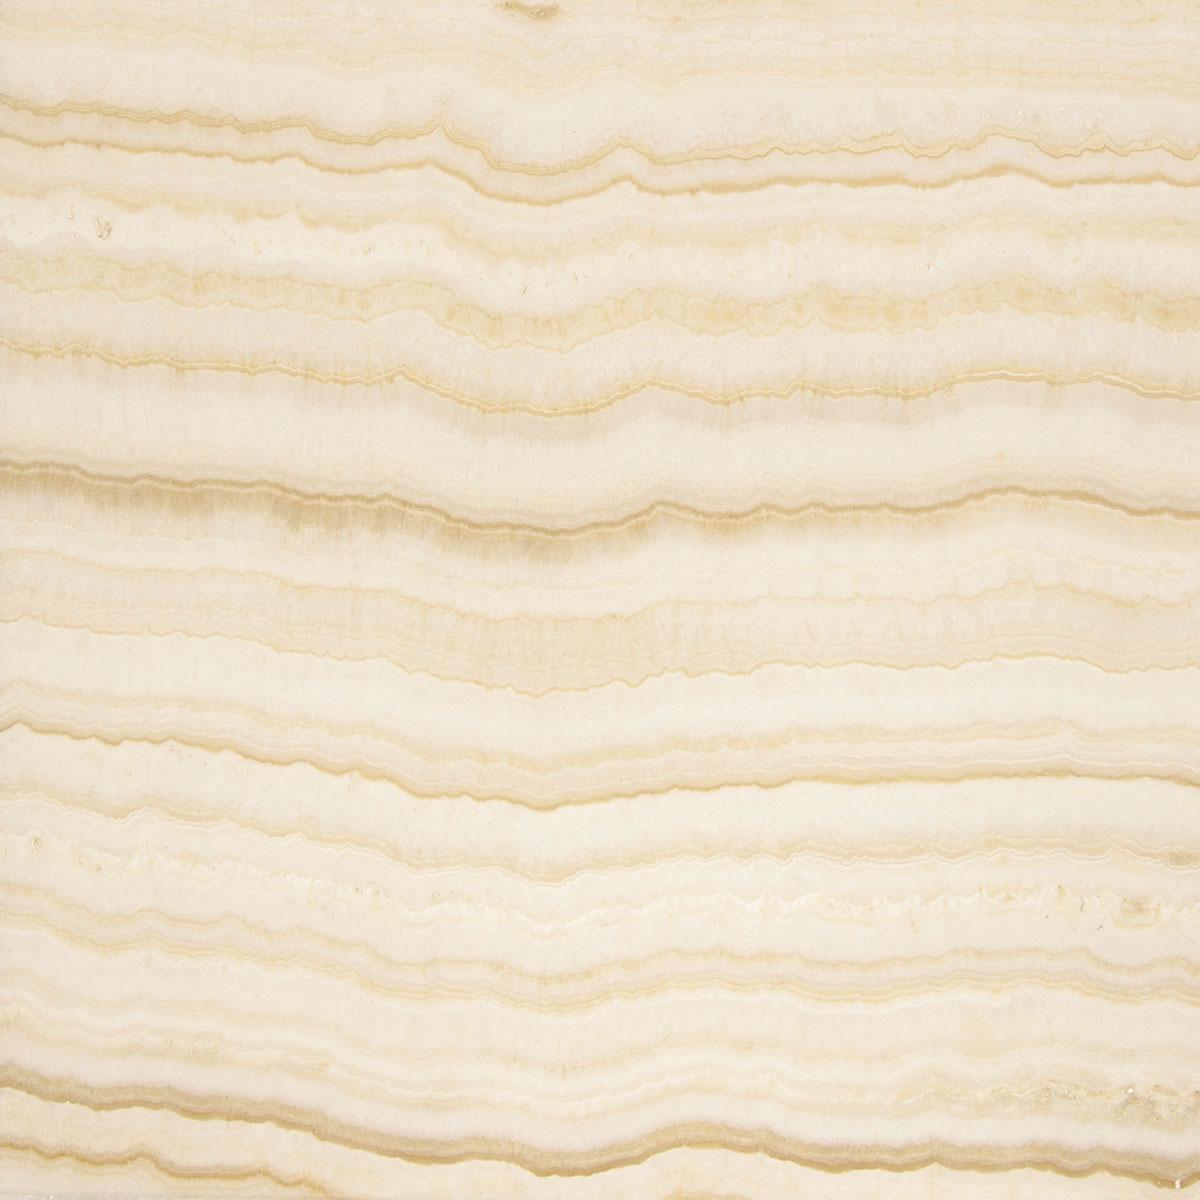 White Onyx Marble : White onyx temmer marble